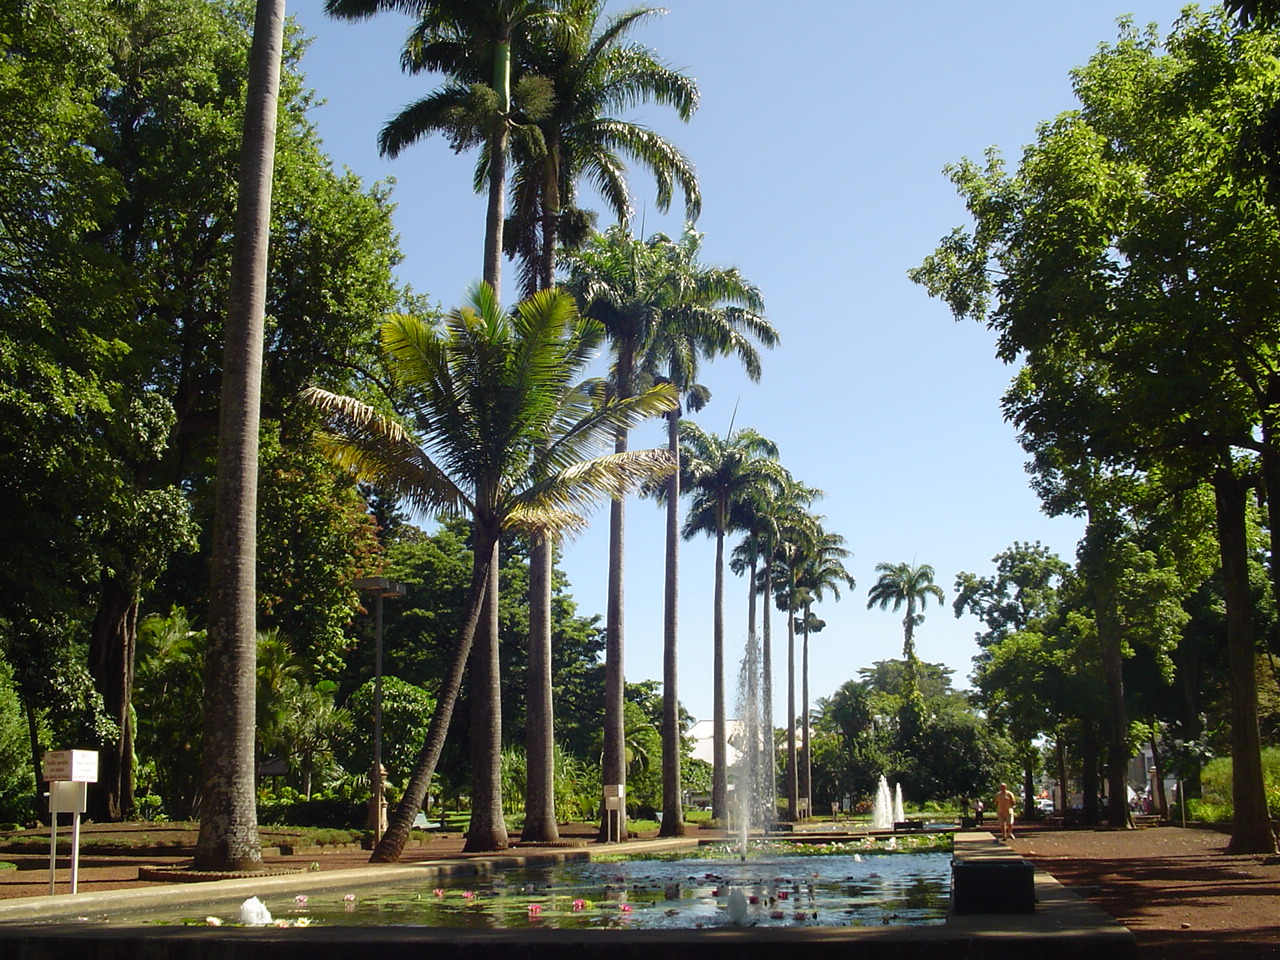 File jardin de letat saint denis 2855616910 jpg - Mobilier jardin cdiscount saint denis ...